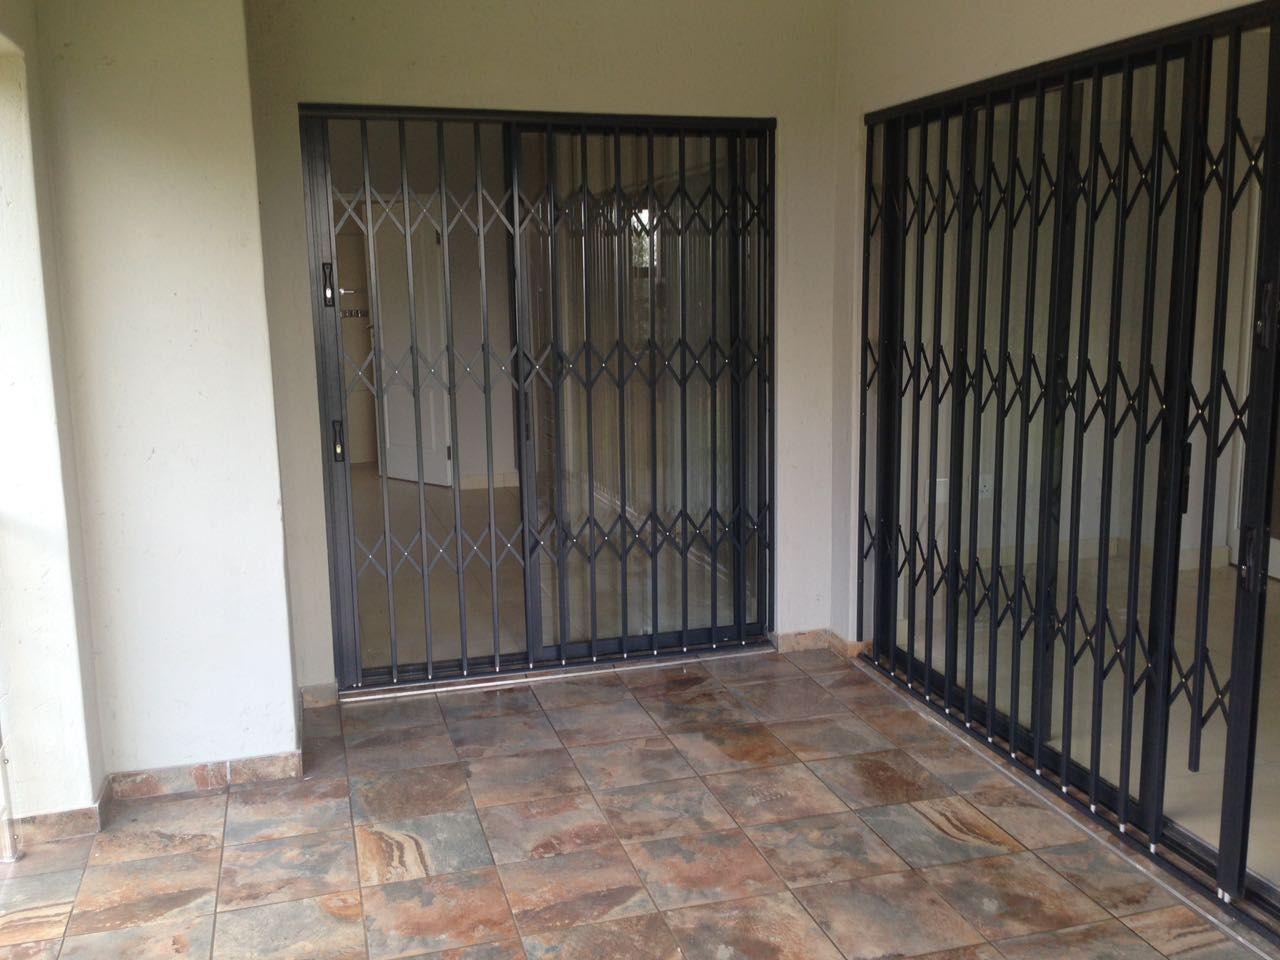 Trellis Doors. We build and install all types of trellis doors for your home and & Trellis Doors. We build and install all types of trellis doors for ... pezcame.com